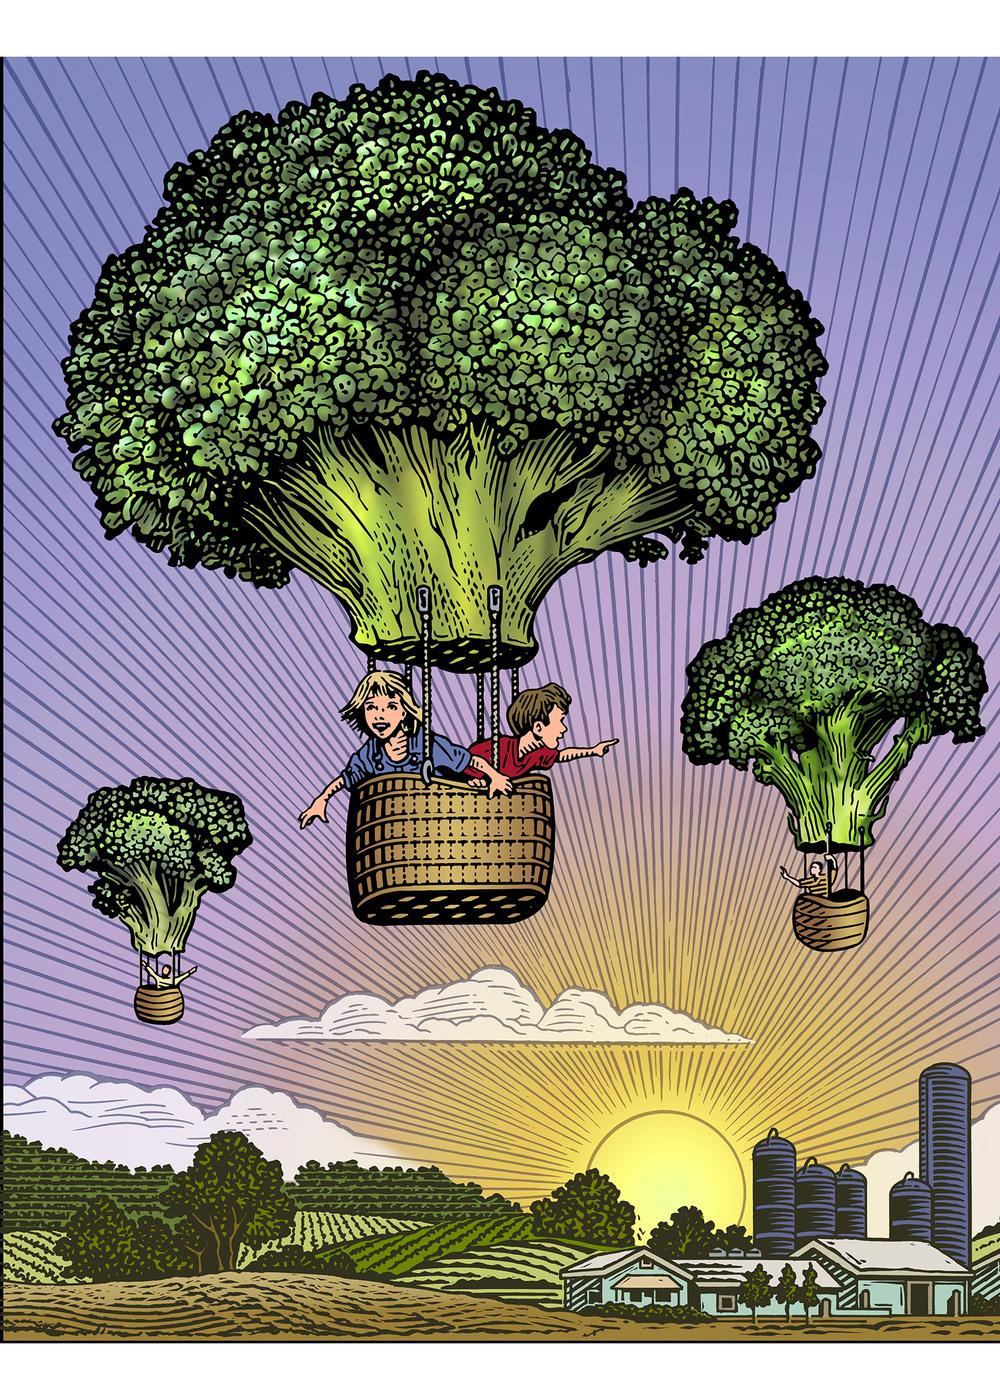 rx_cc_farm.jpg